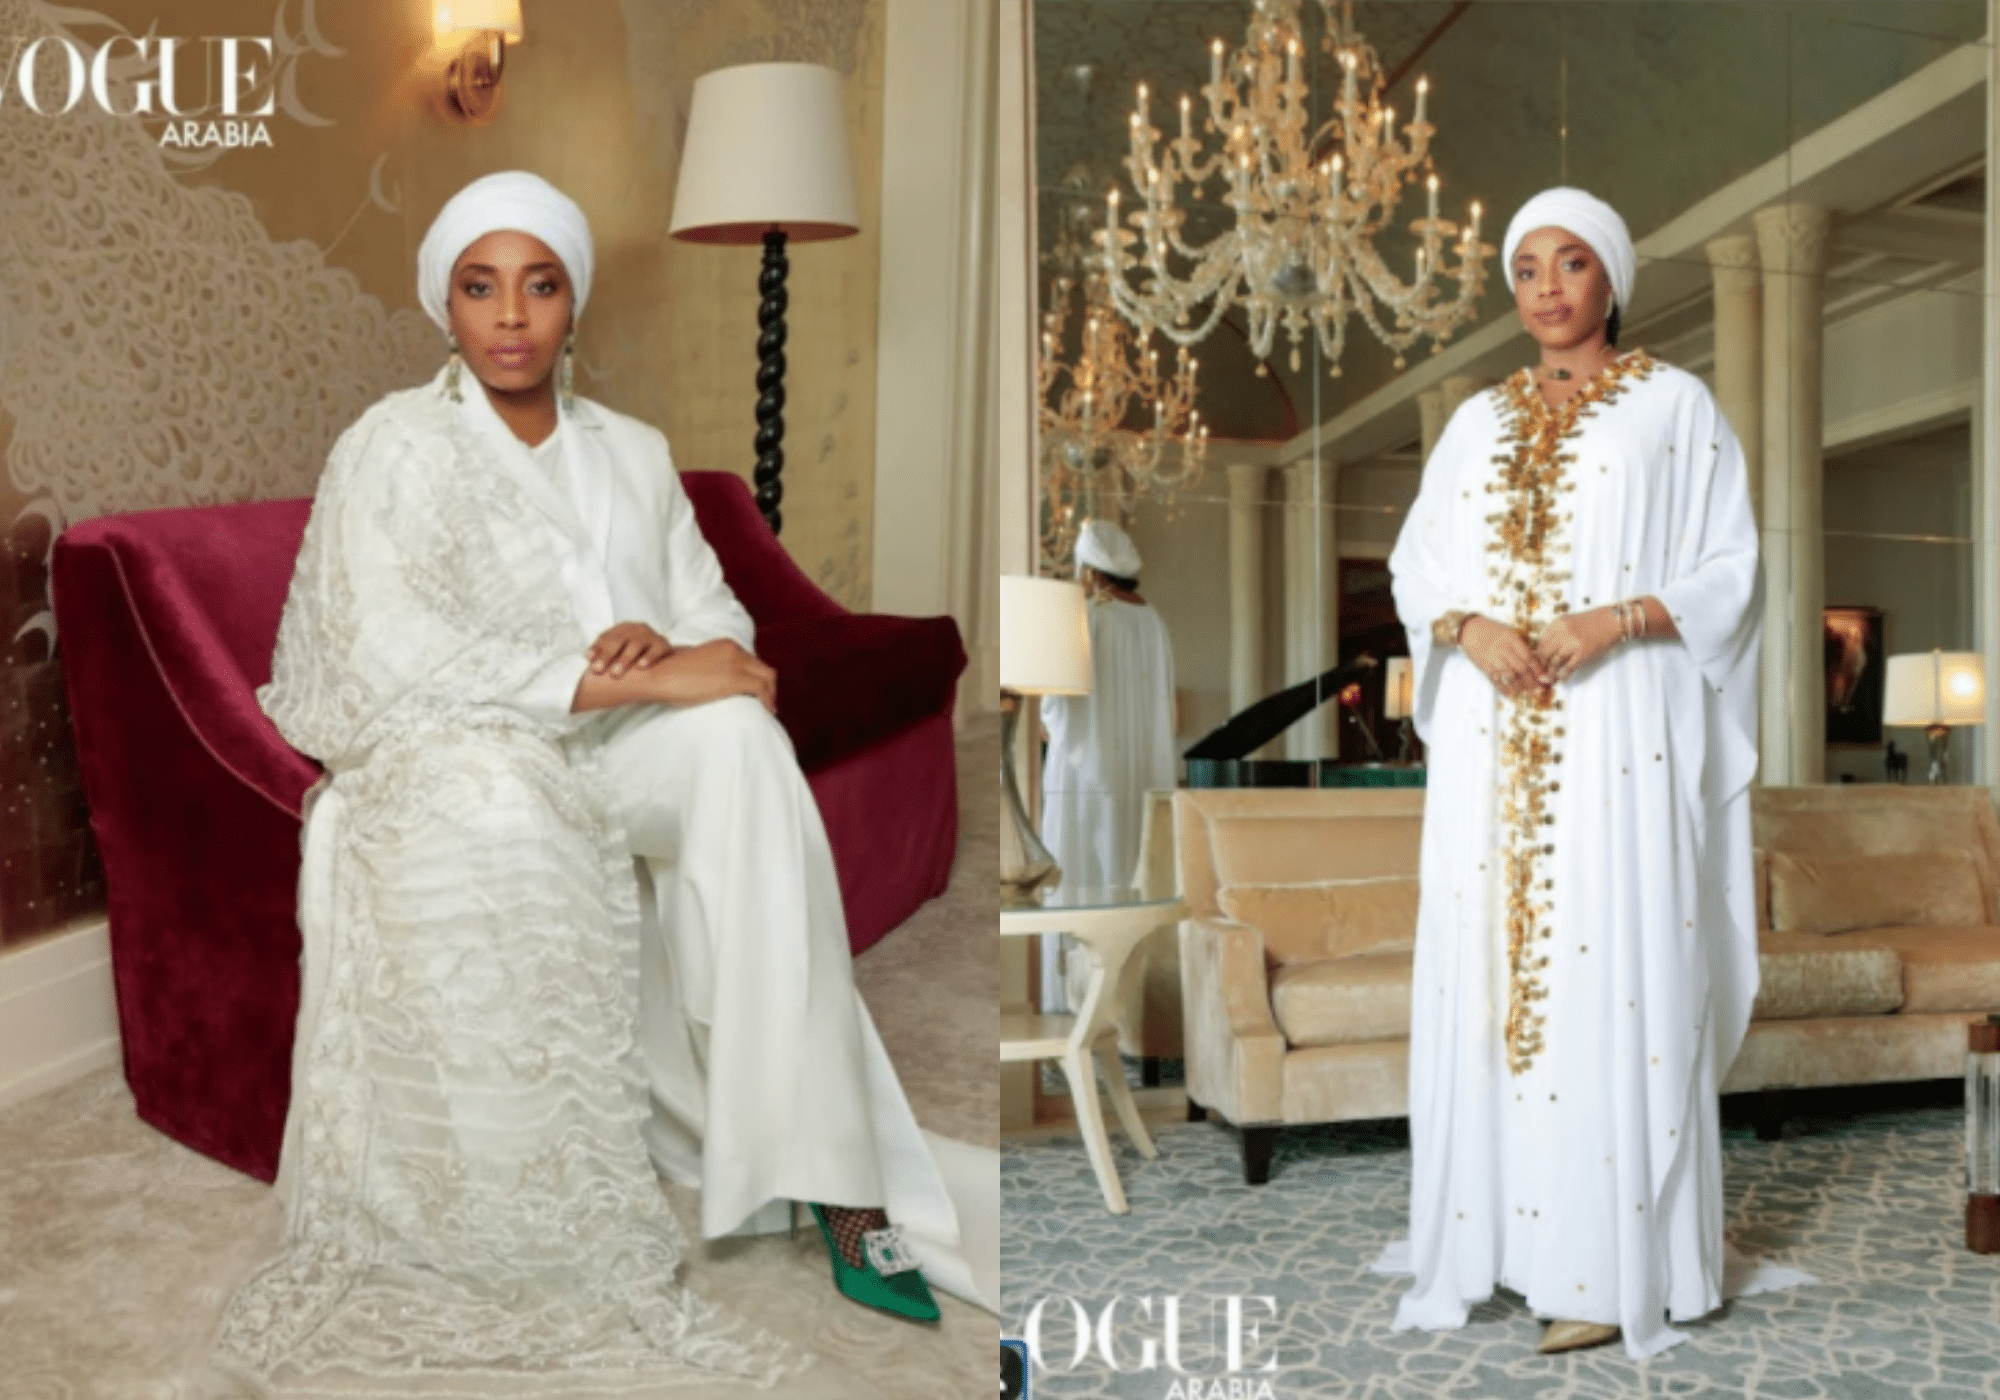 Queen Zainab interview with vogue arabia